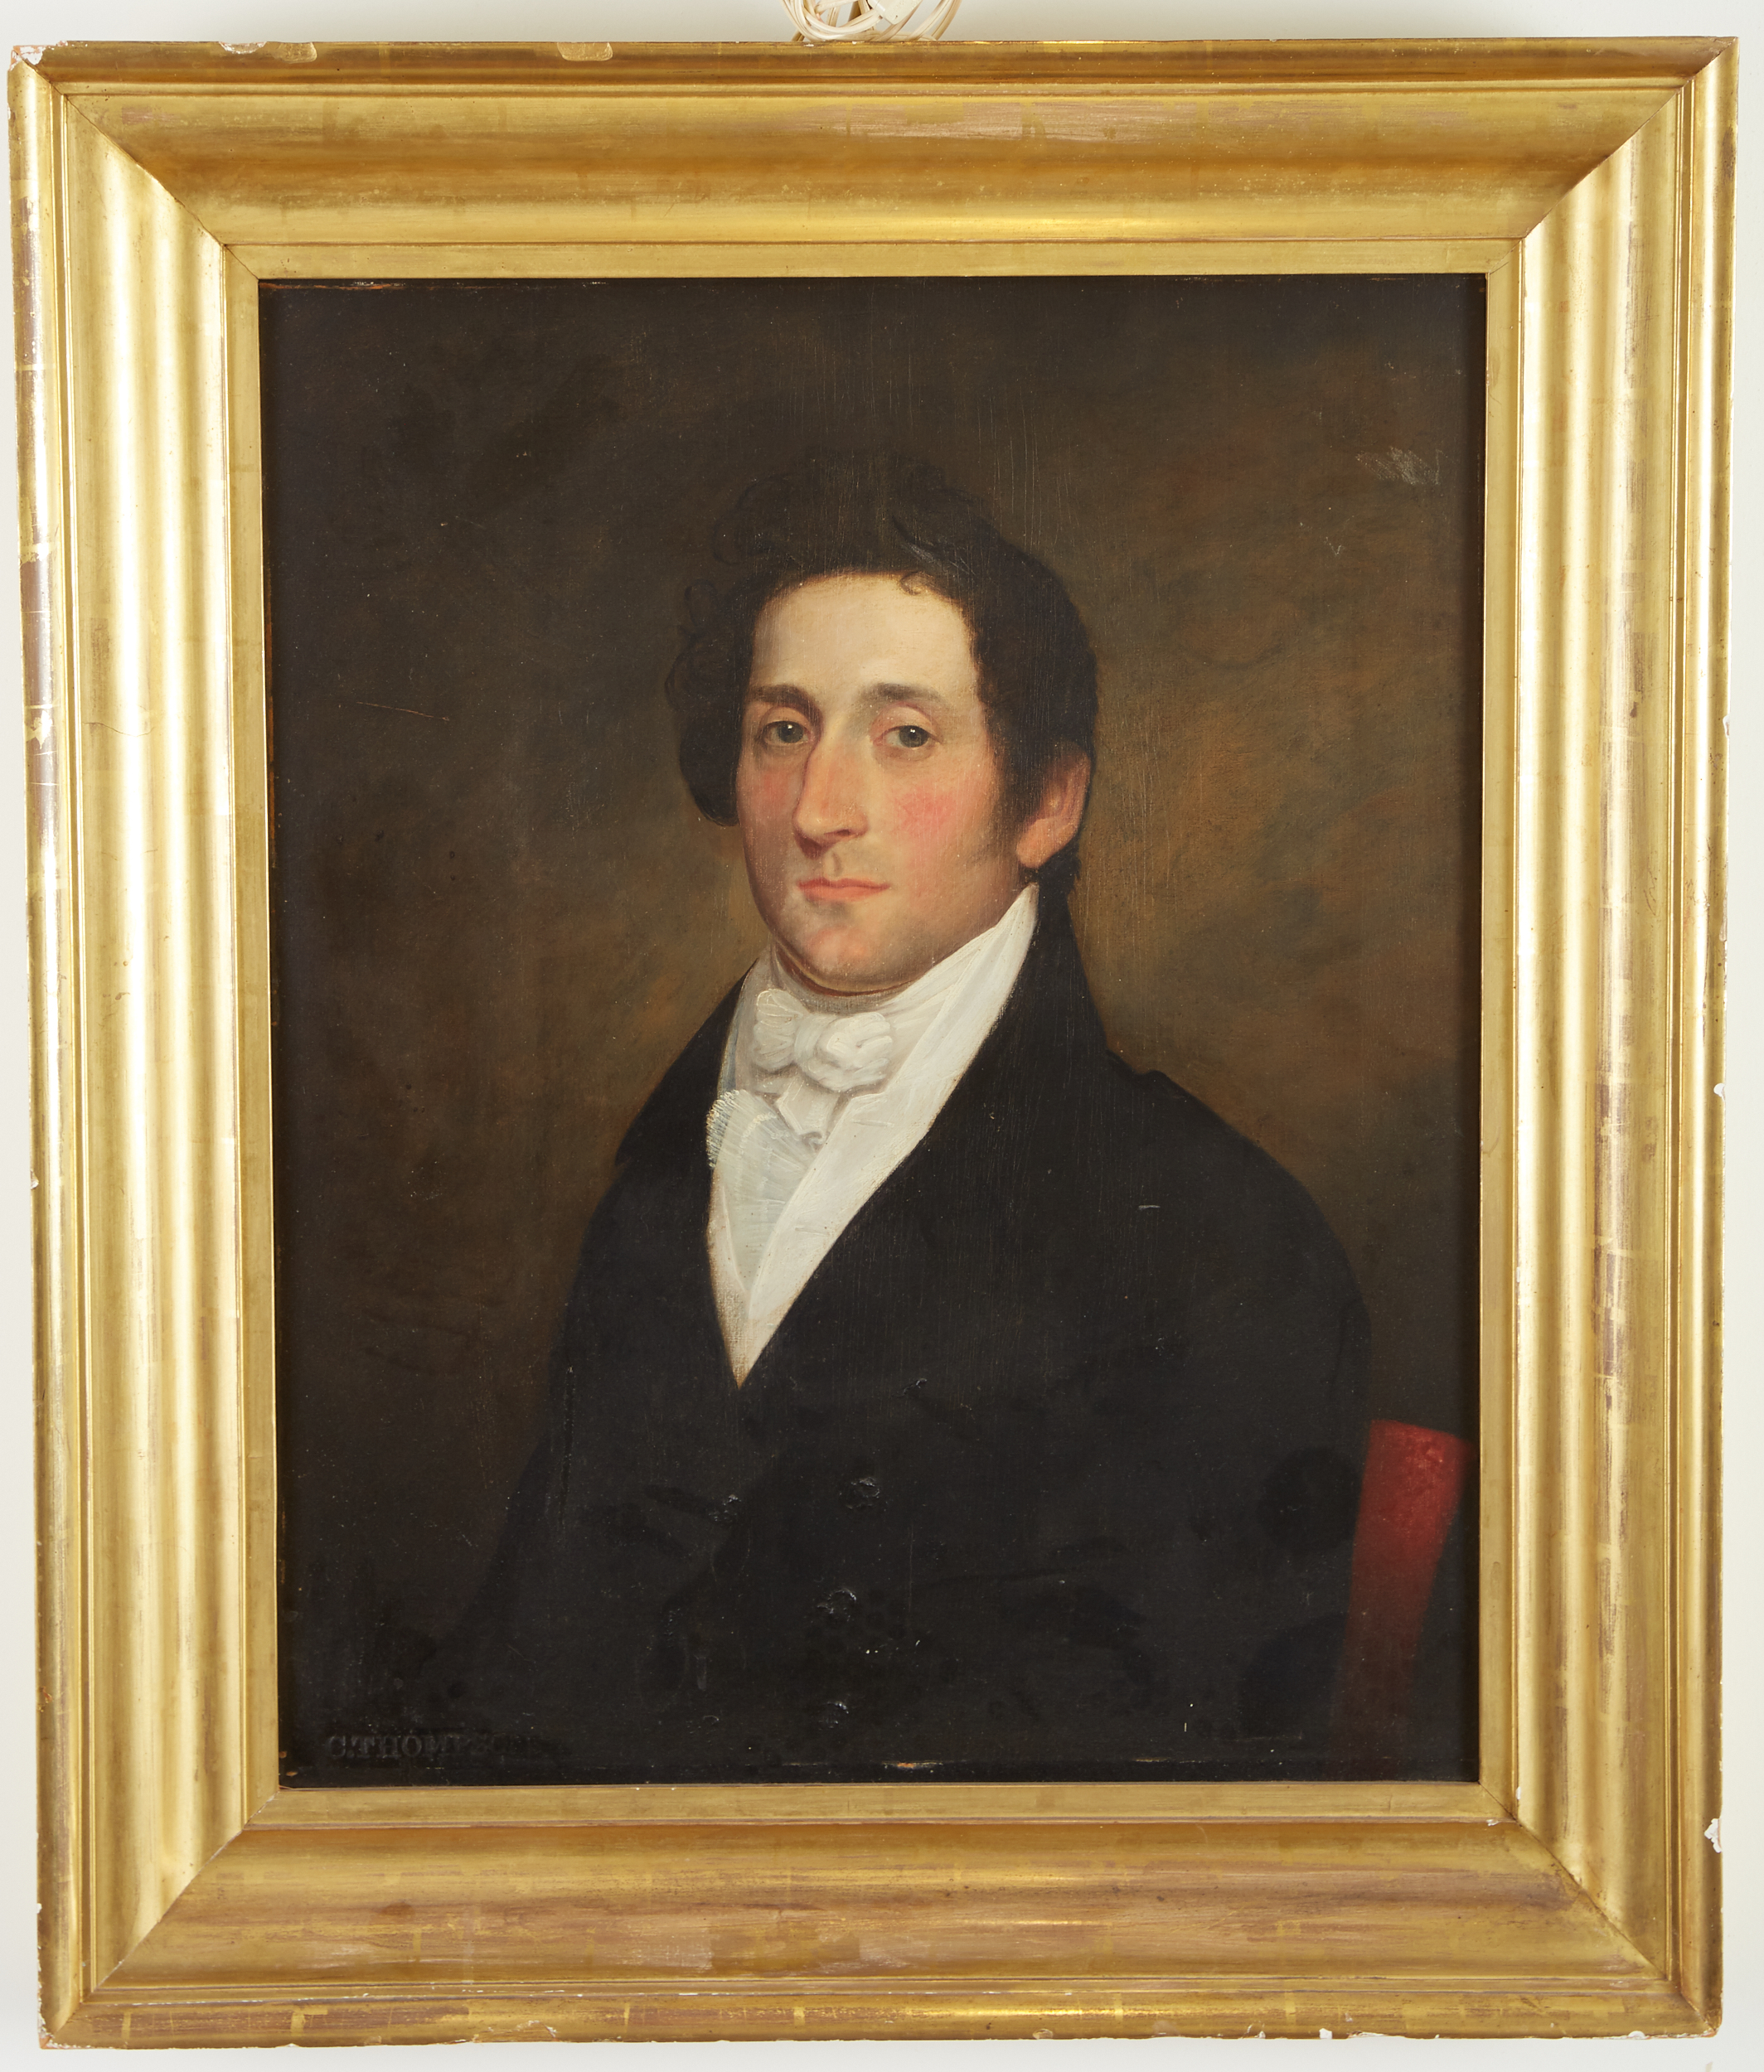 Lot 10 - Cephas Thompson Gentleman with White Stock